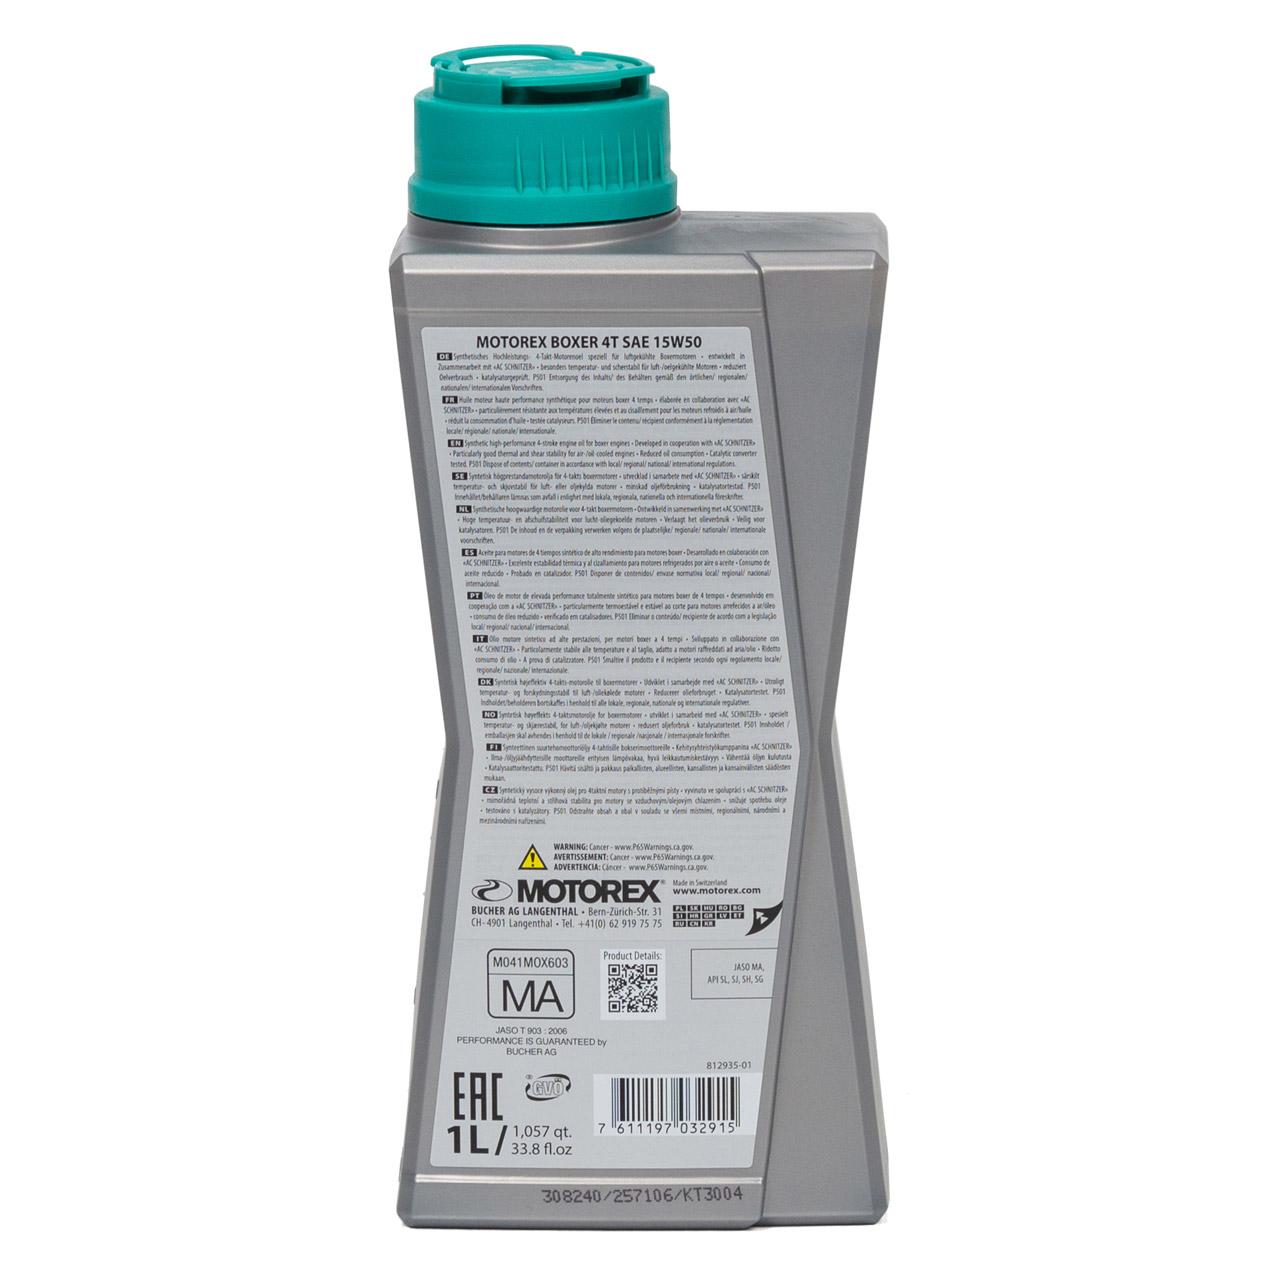 MOTOREX Boxer 4T Motoröl Öl 15W-50 15W50 JASO MA API SL/SJ/SH/SG - 1L 1 Liter